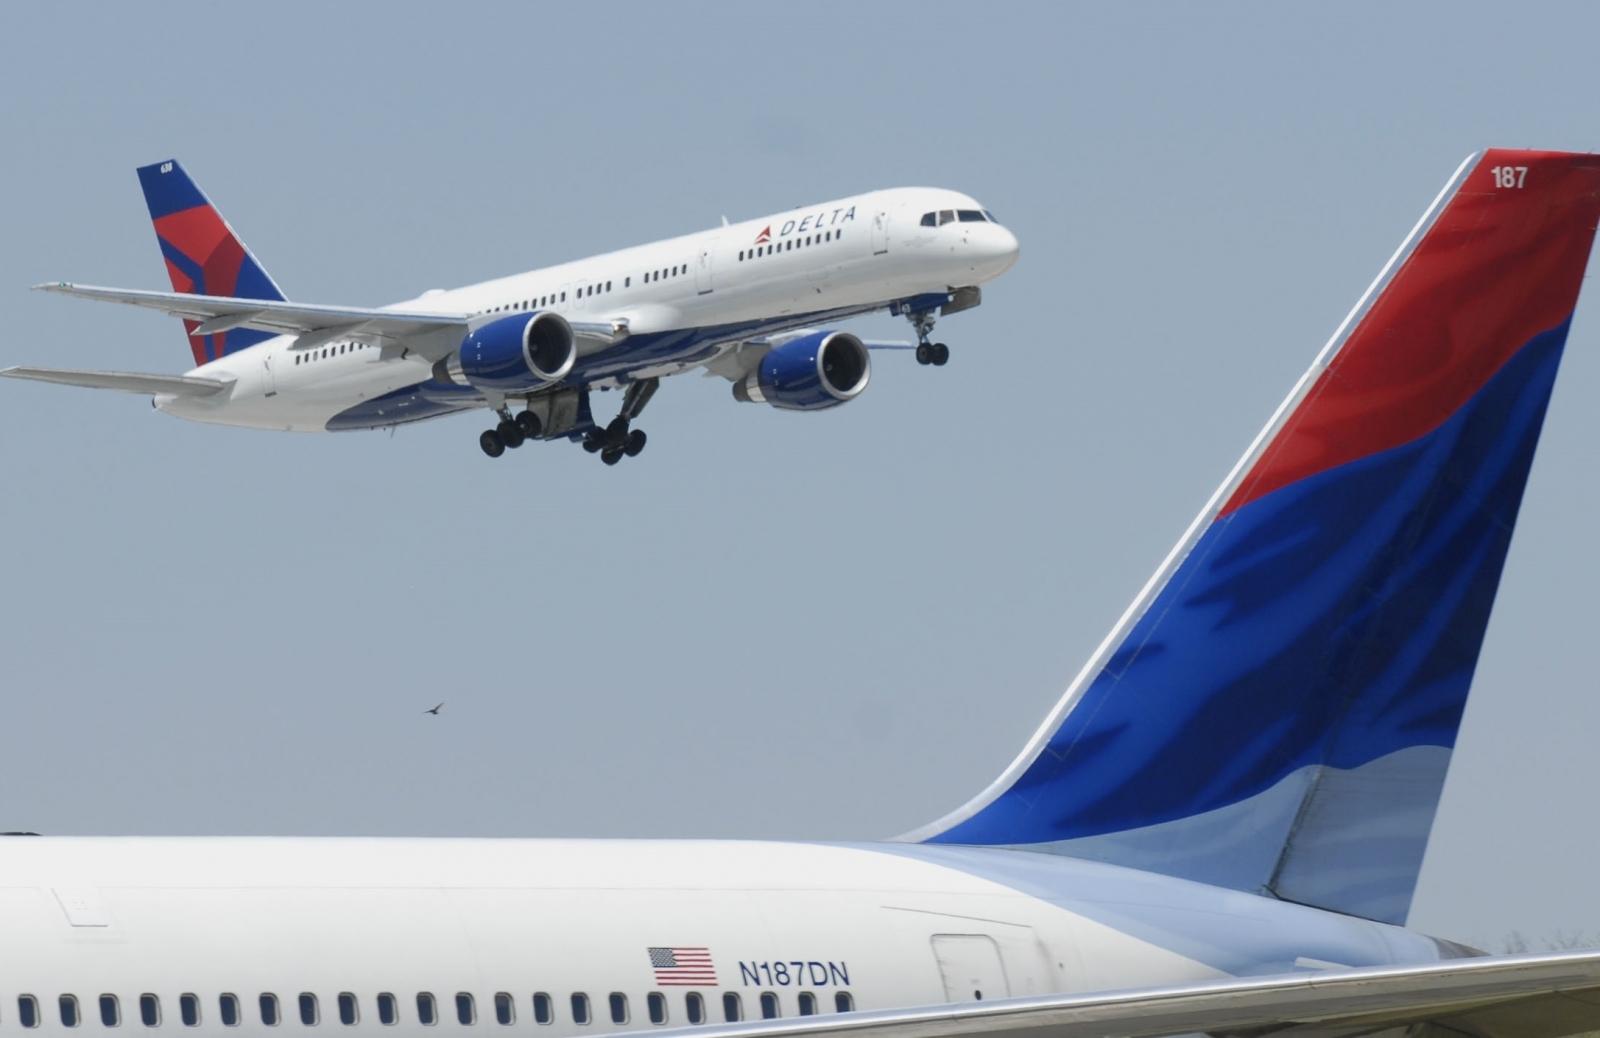 Delta flight makes emergency landing after broken window